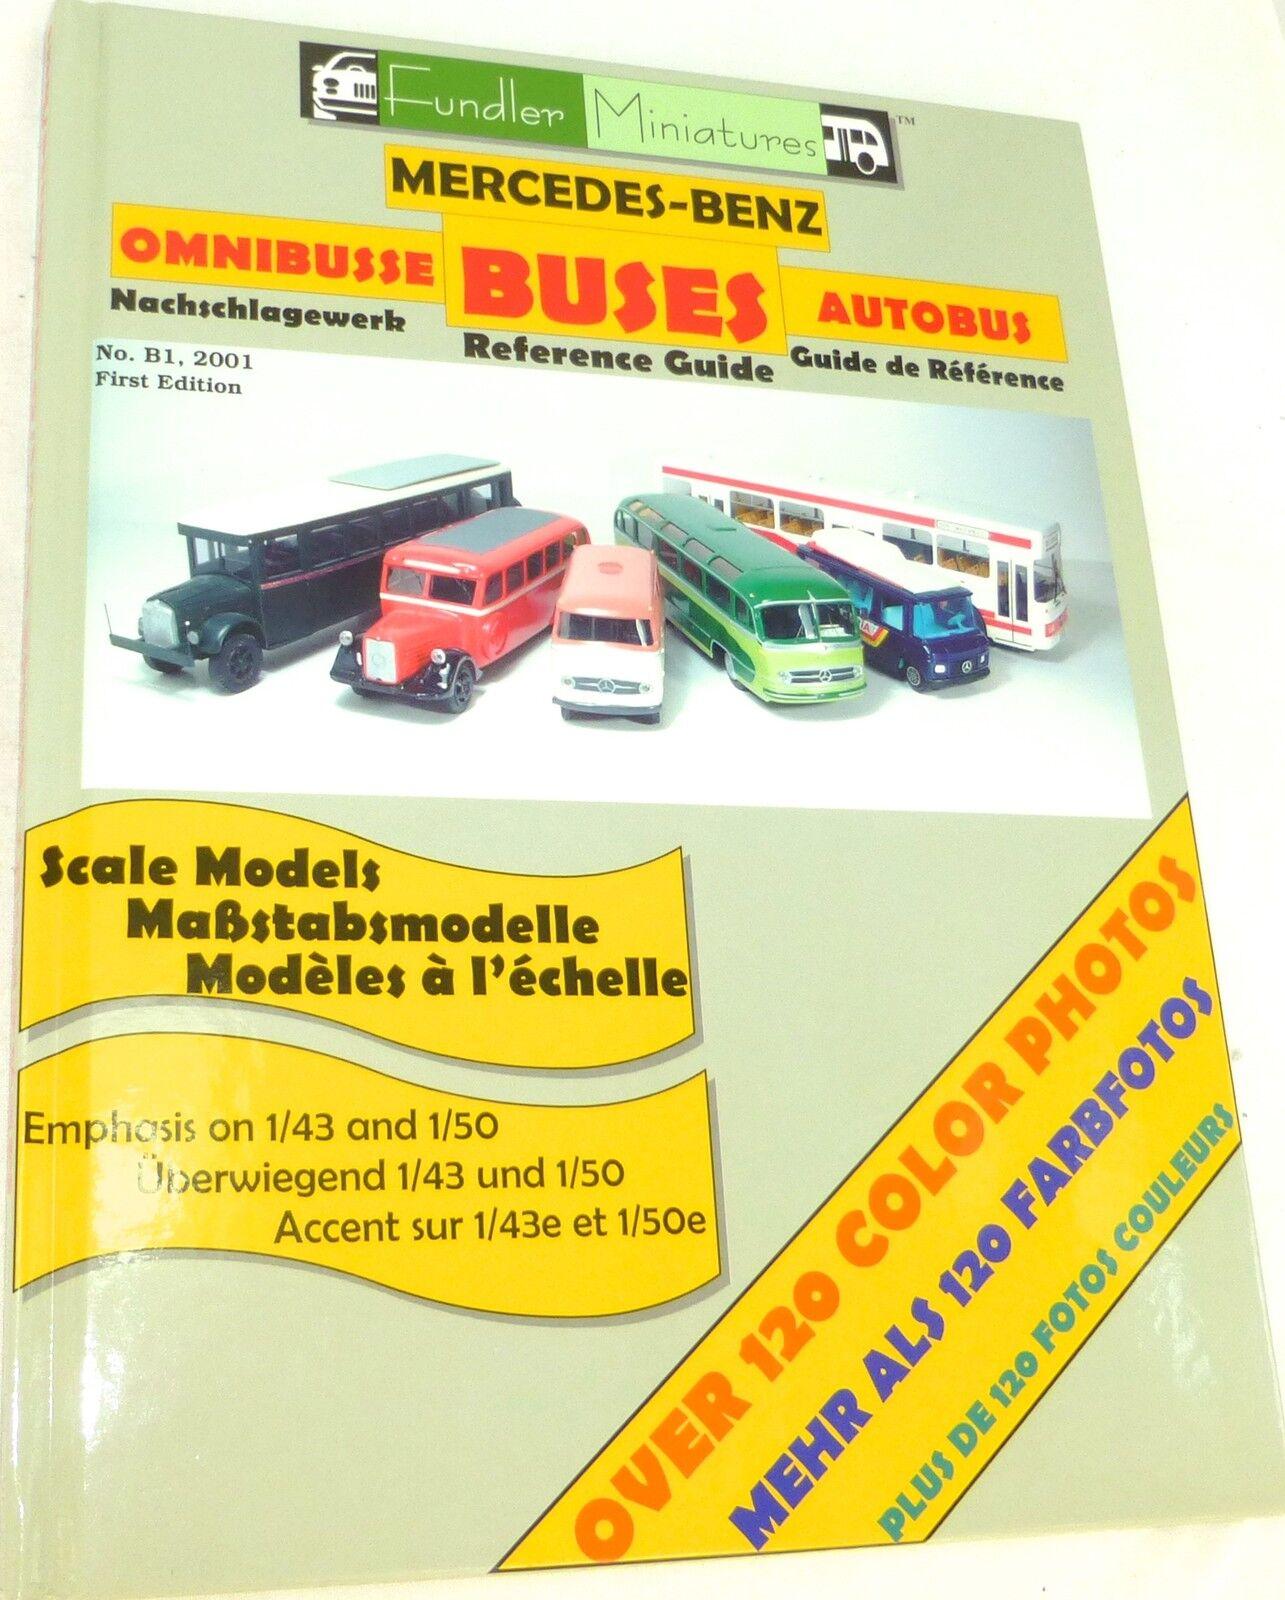 Autoautobus divertimentodler Miniature Mercedes Benz e Pulluomo Pulluomo Pulluomo autobus Reference Guide   Å 043f21